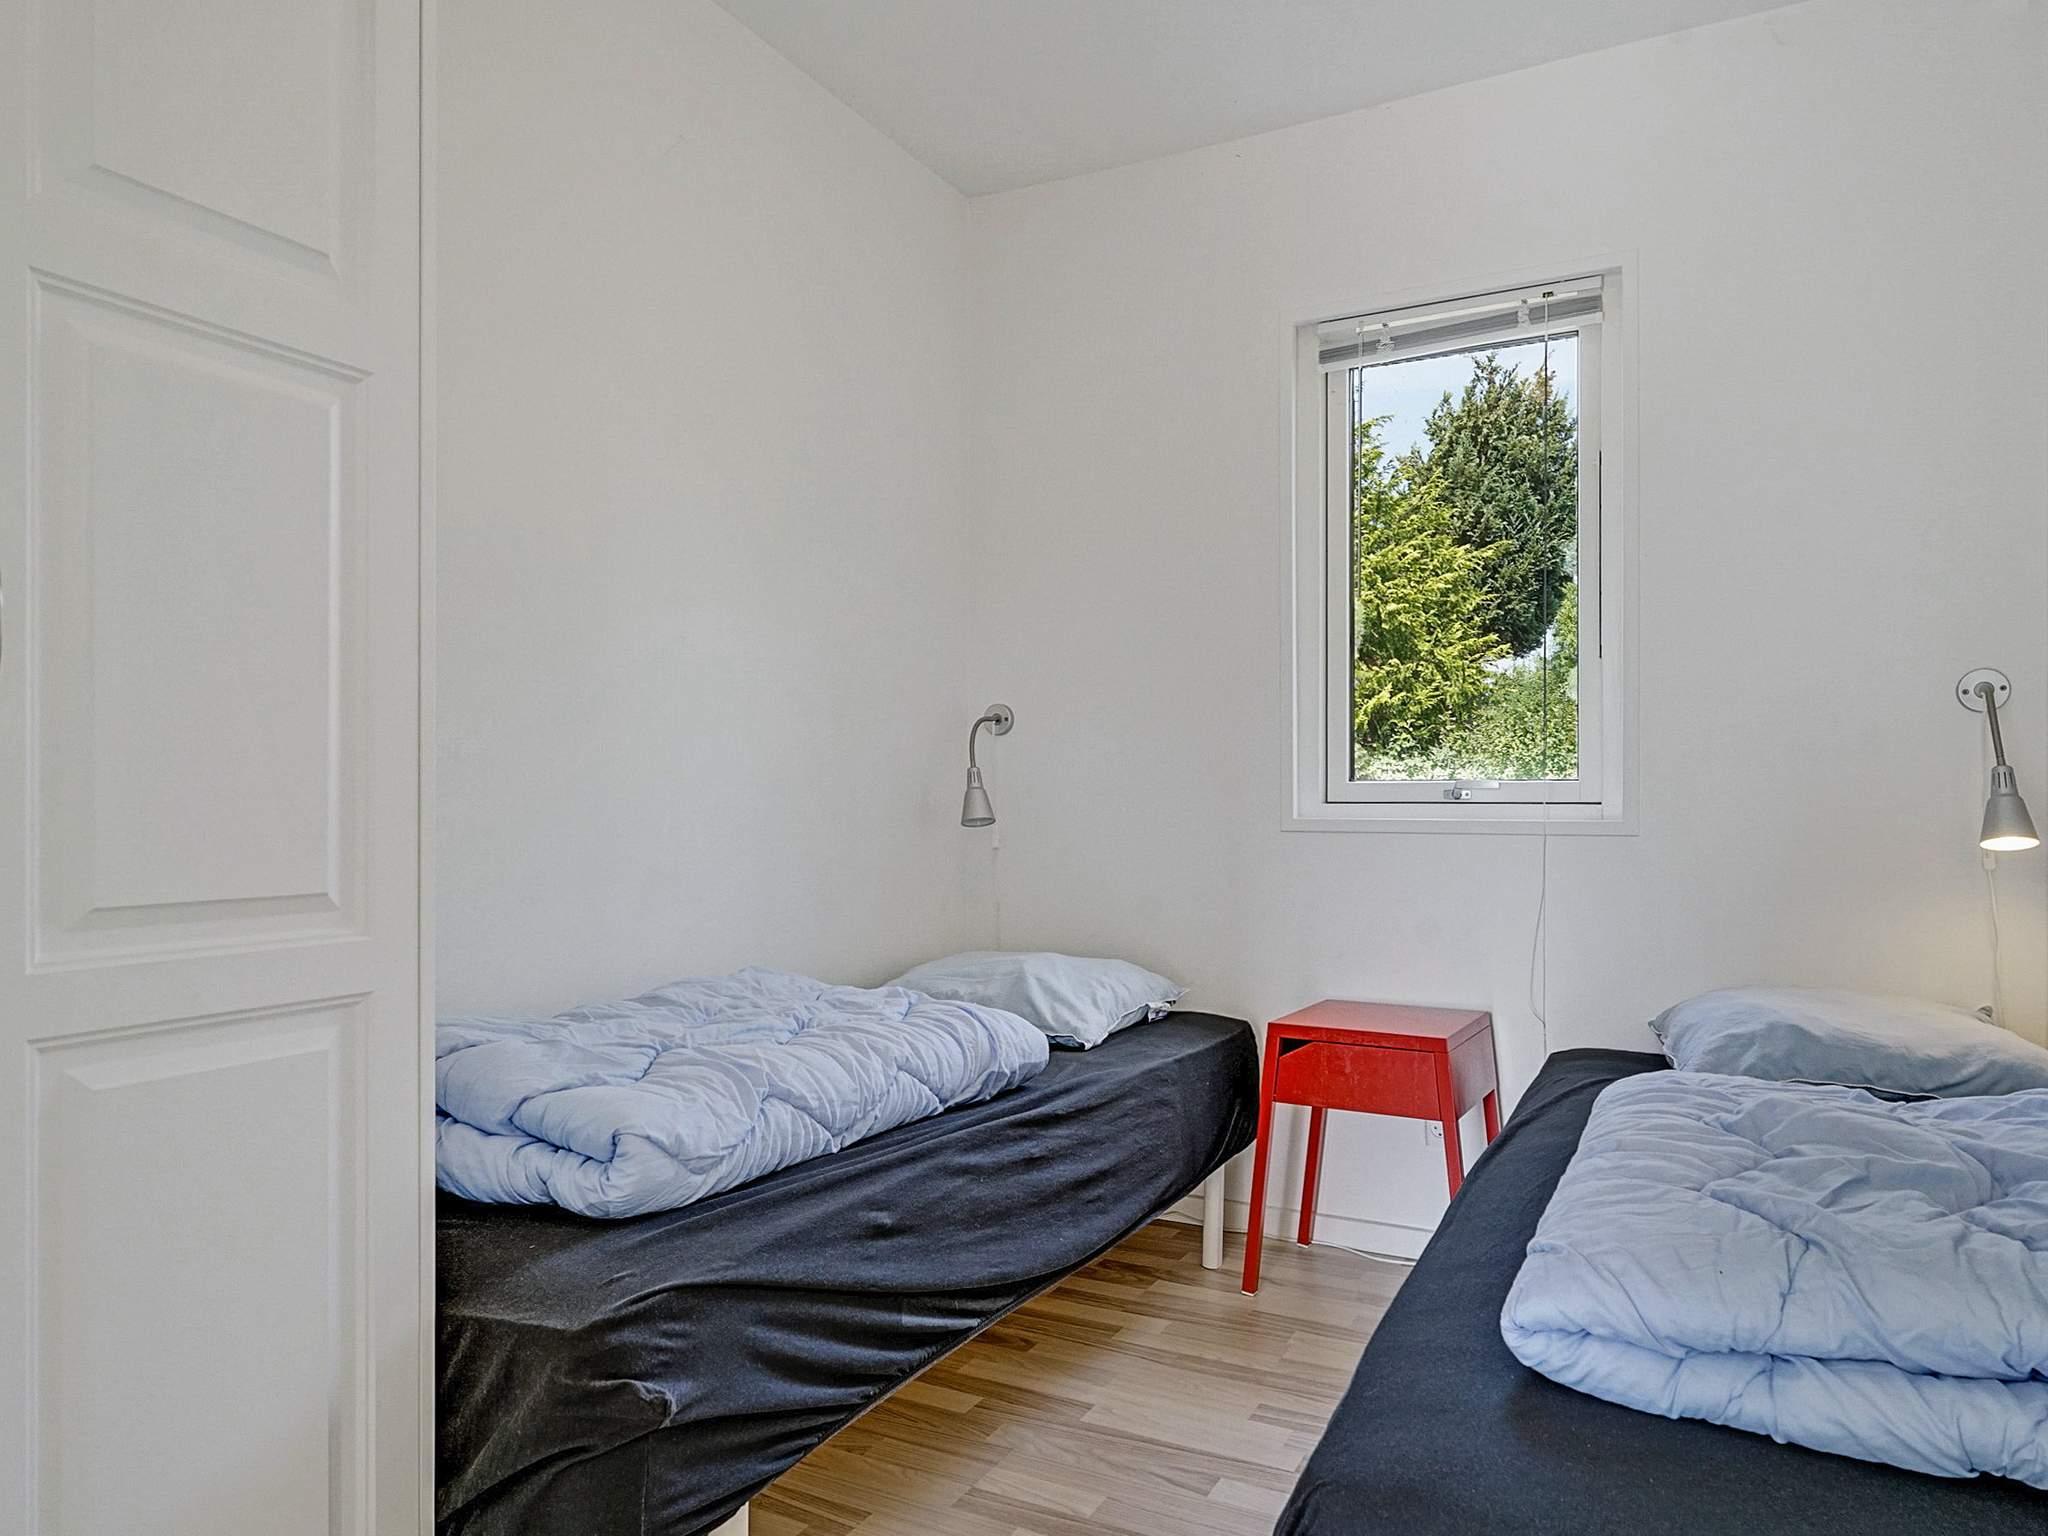 Ferienhaus Bukkemose (500812), Humble, , Langeland, Dänemark, Bild 11